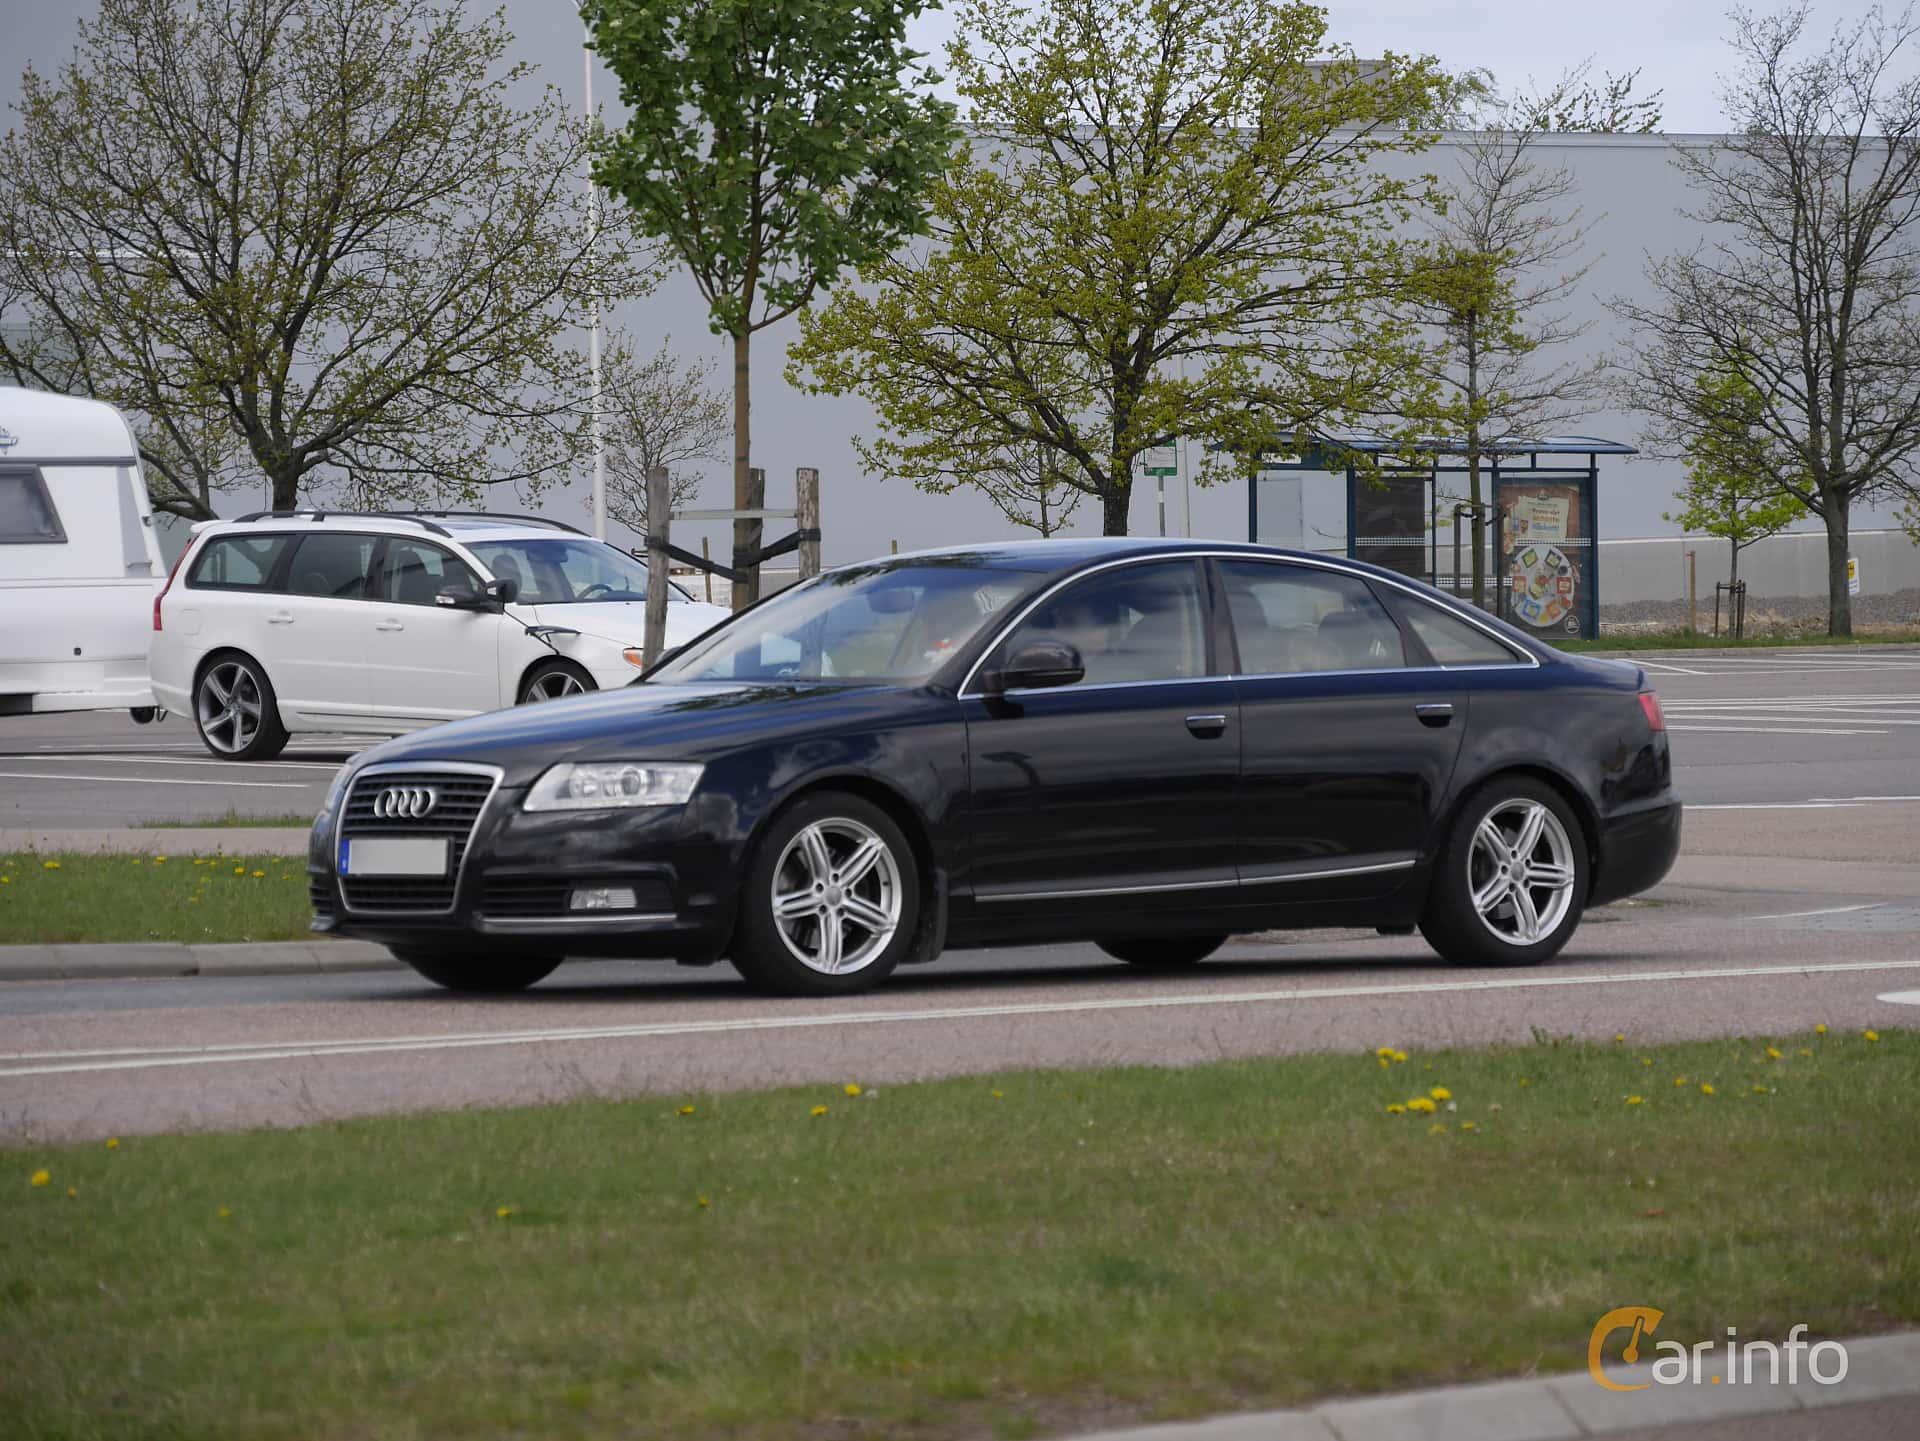 2 images of Audi A6 Sedan 2 0 TDI e Manual 136hp 2010 by